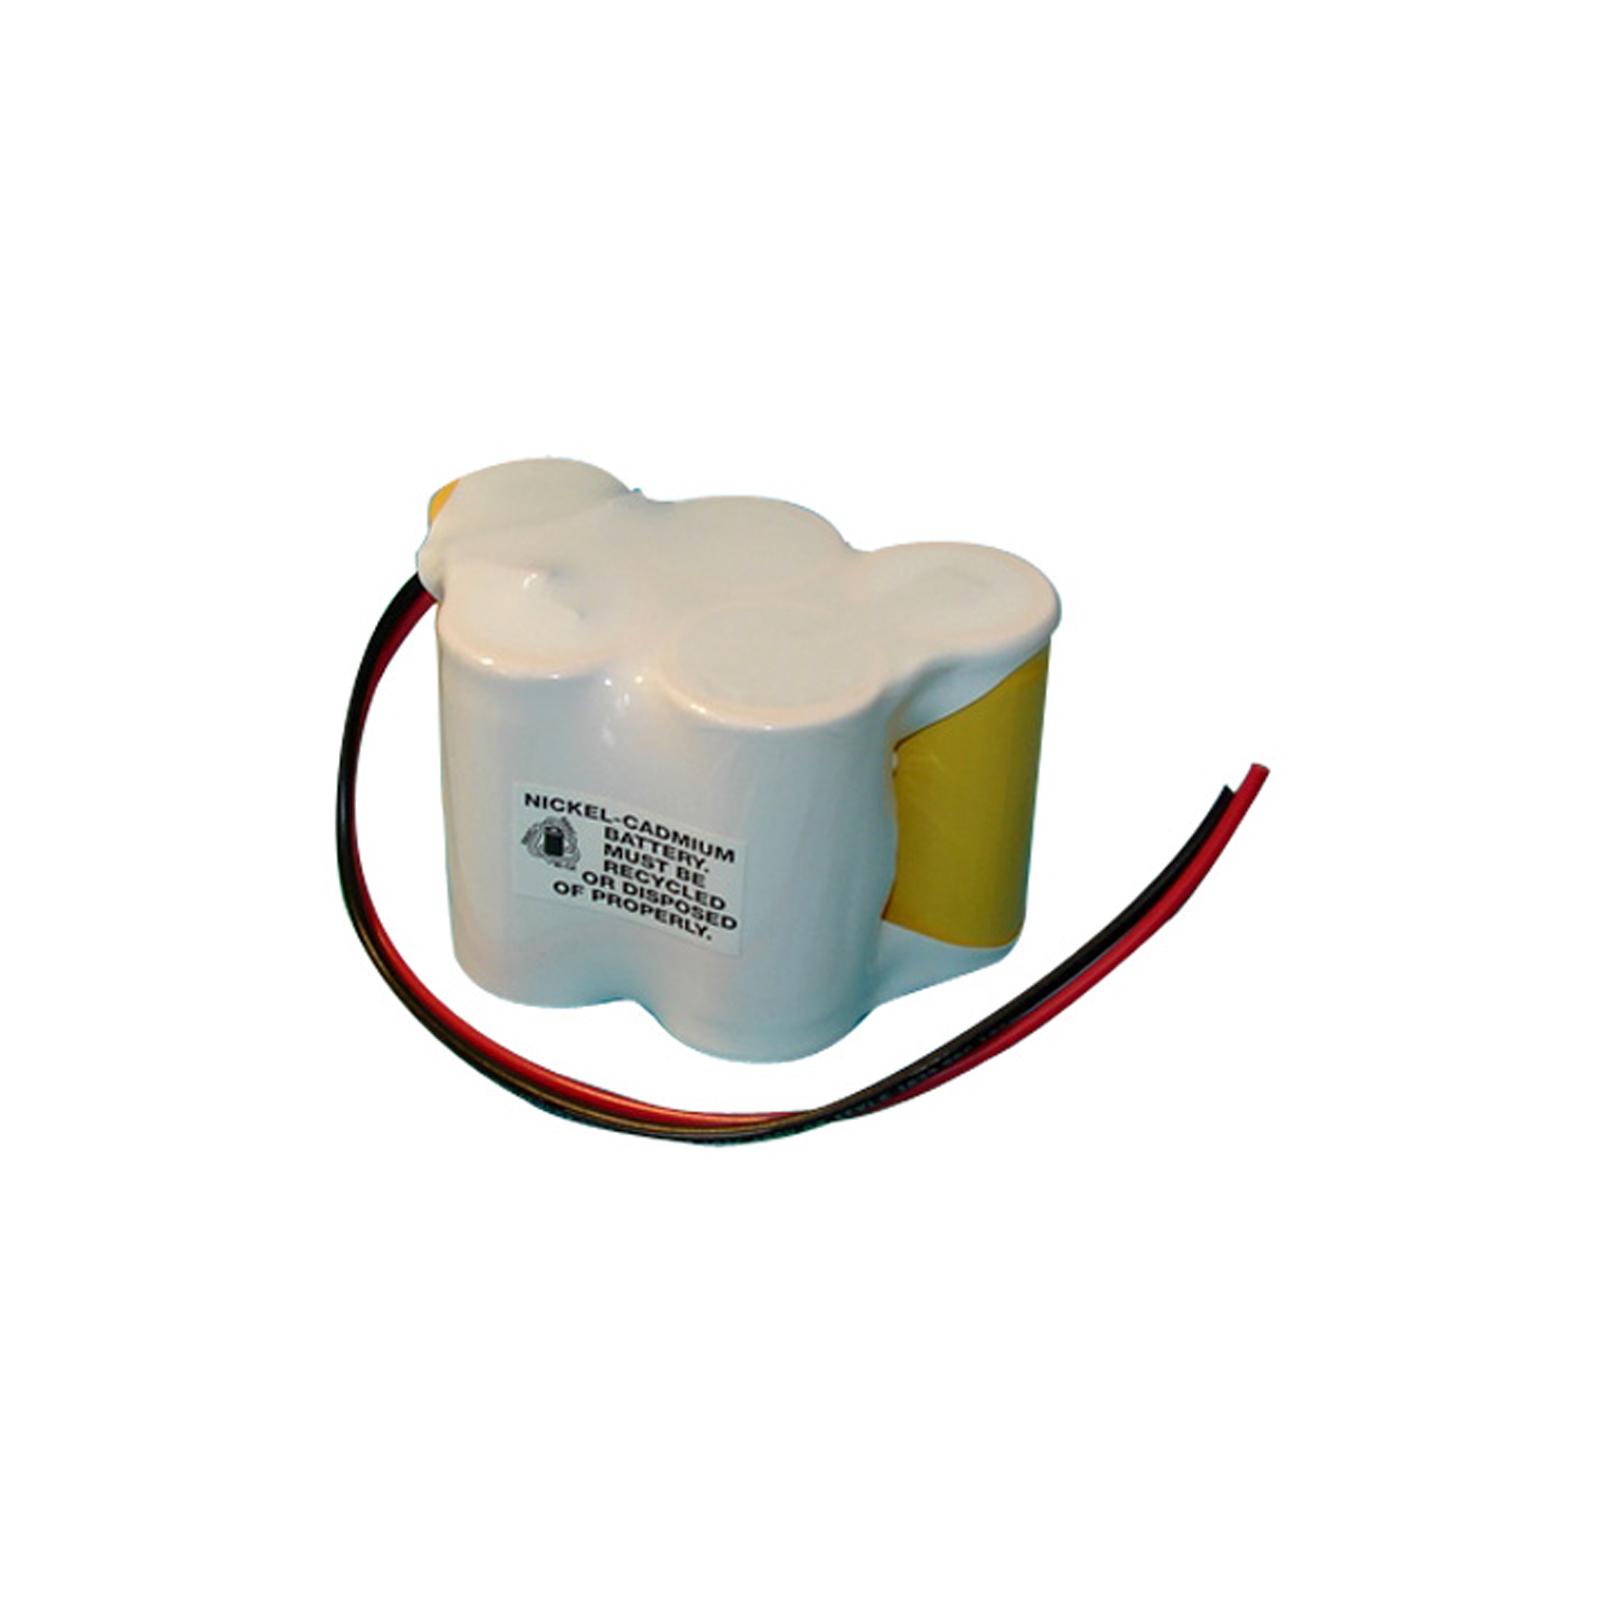 Lithonia Lighting Emergency Light Battery: Emergency Lighting Exit Sign Battery For Lithonia ELB0604N